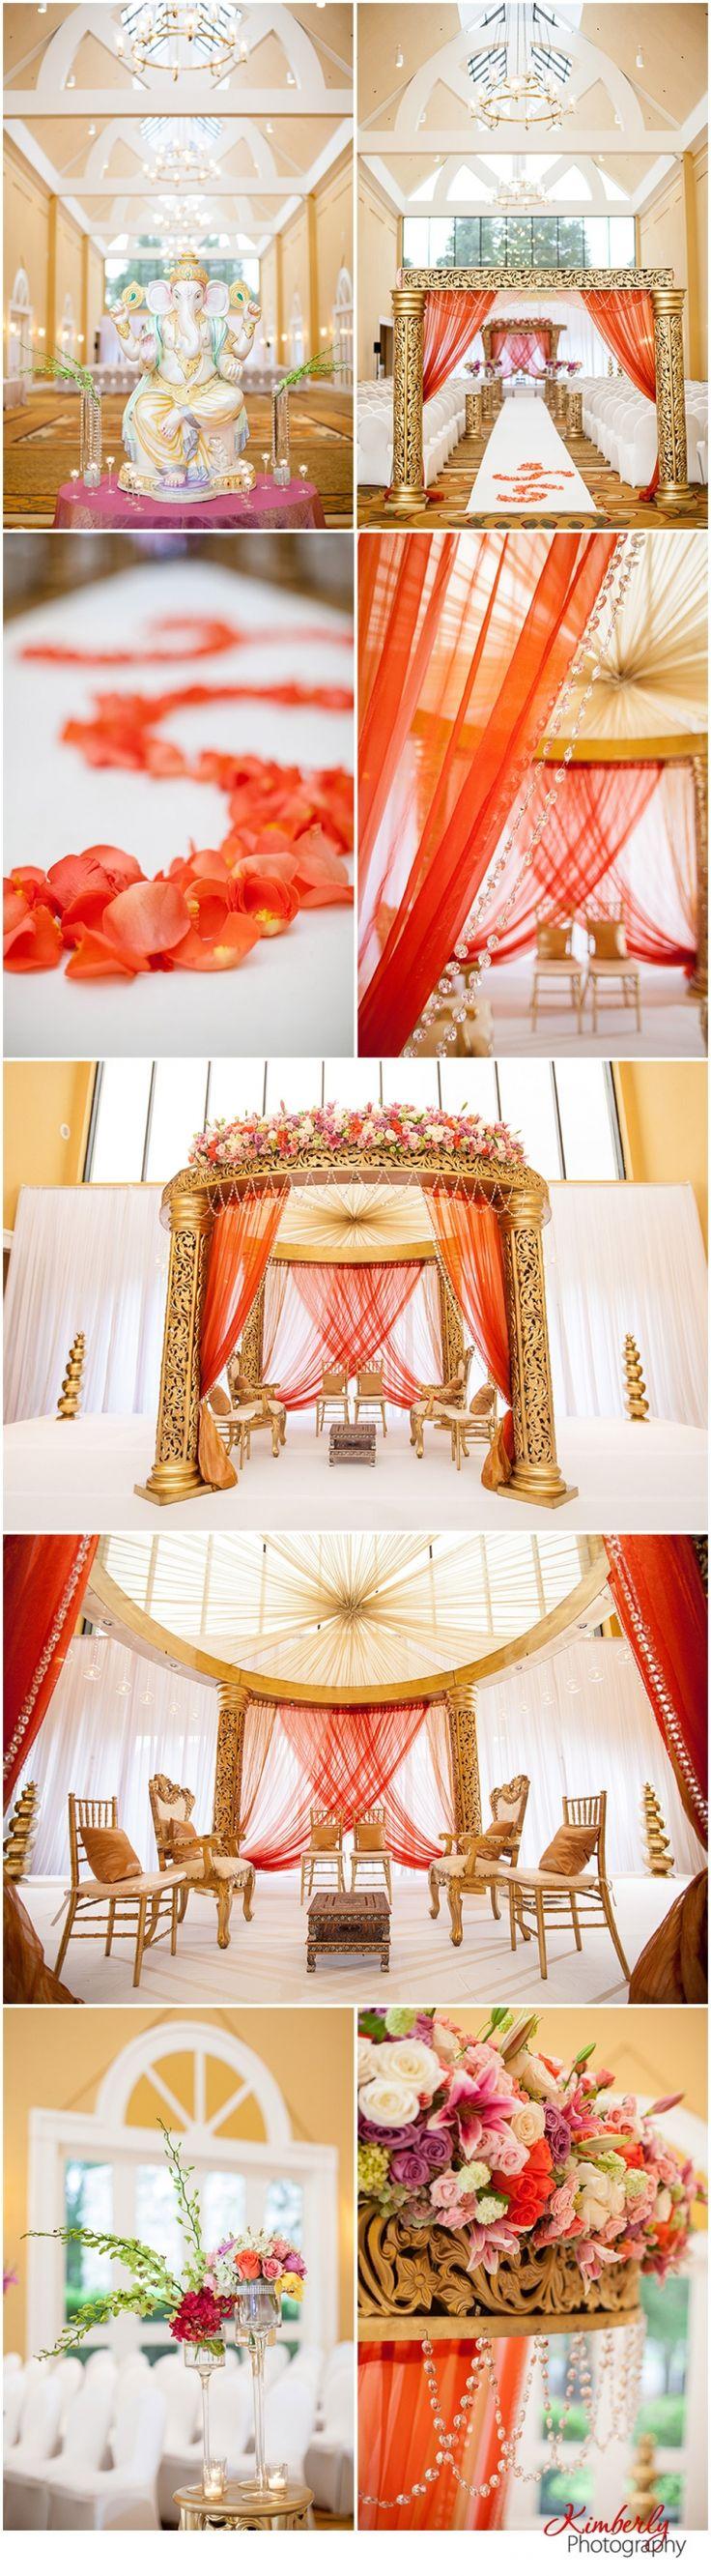 Rajasthani wedding stage decoration   best Valerieus sweet  Ideas images on Pinterest